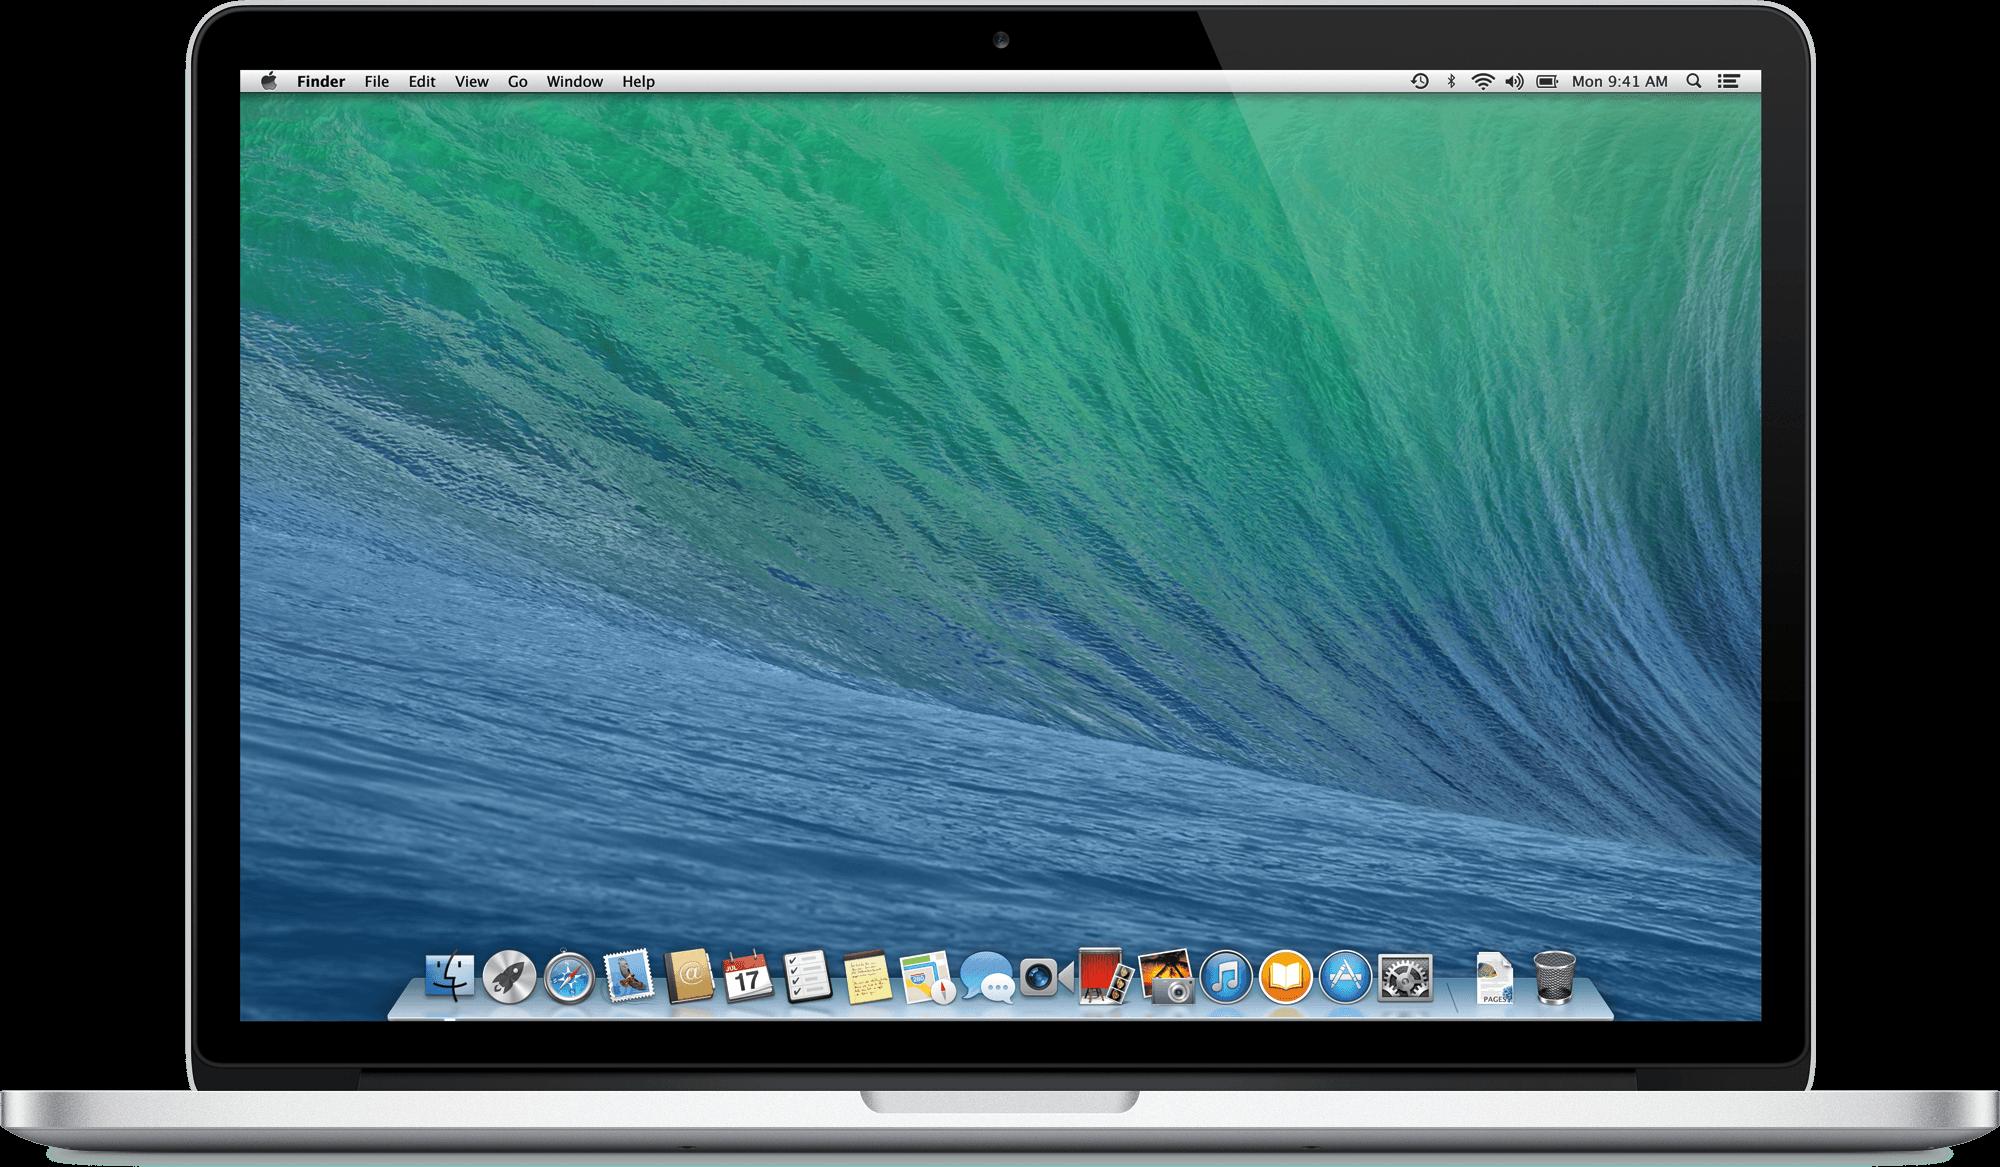 Macbook Png Image Apple Macbook Pro Apple Macbook Apple Laptop